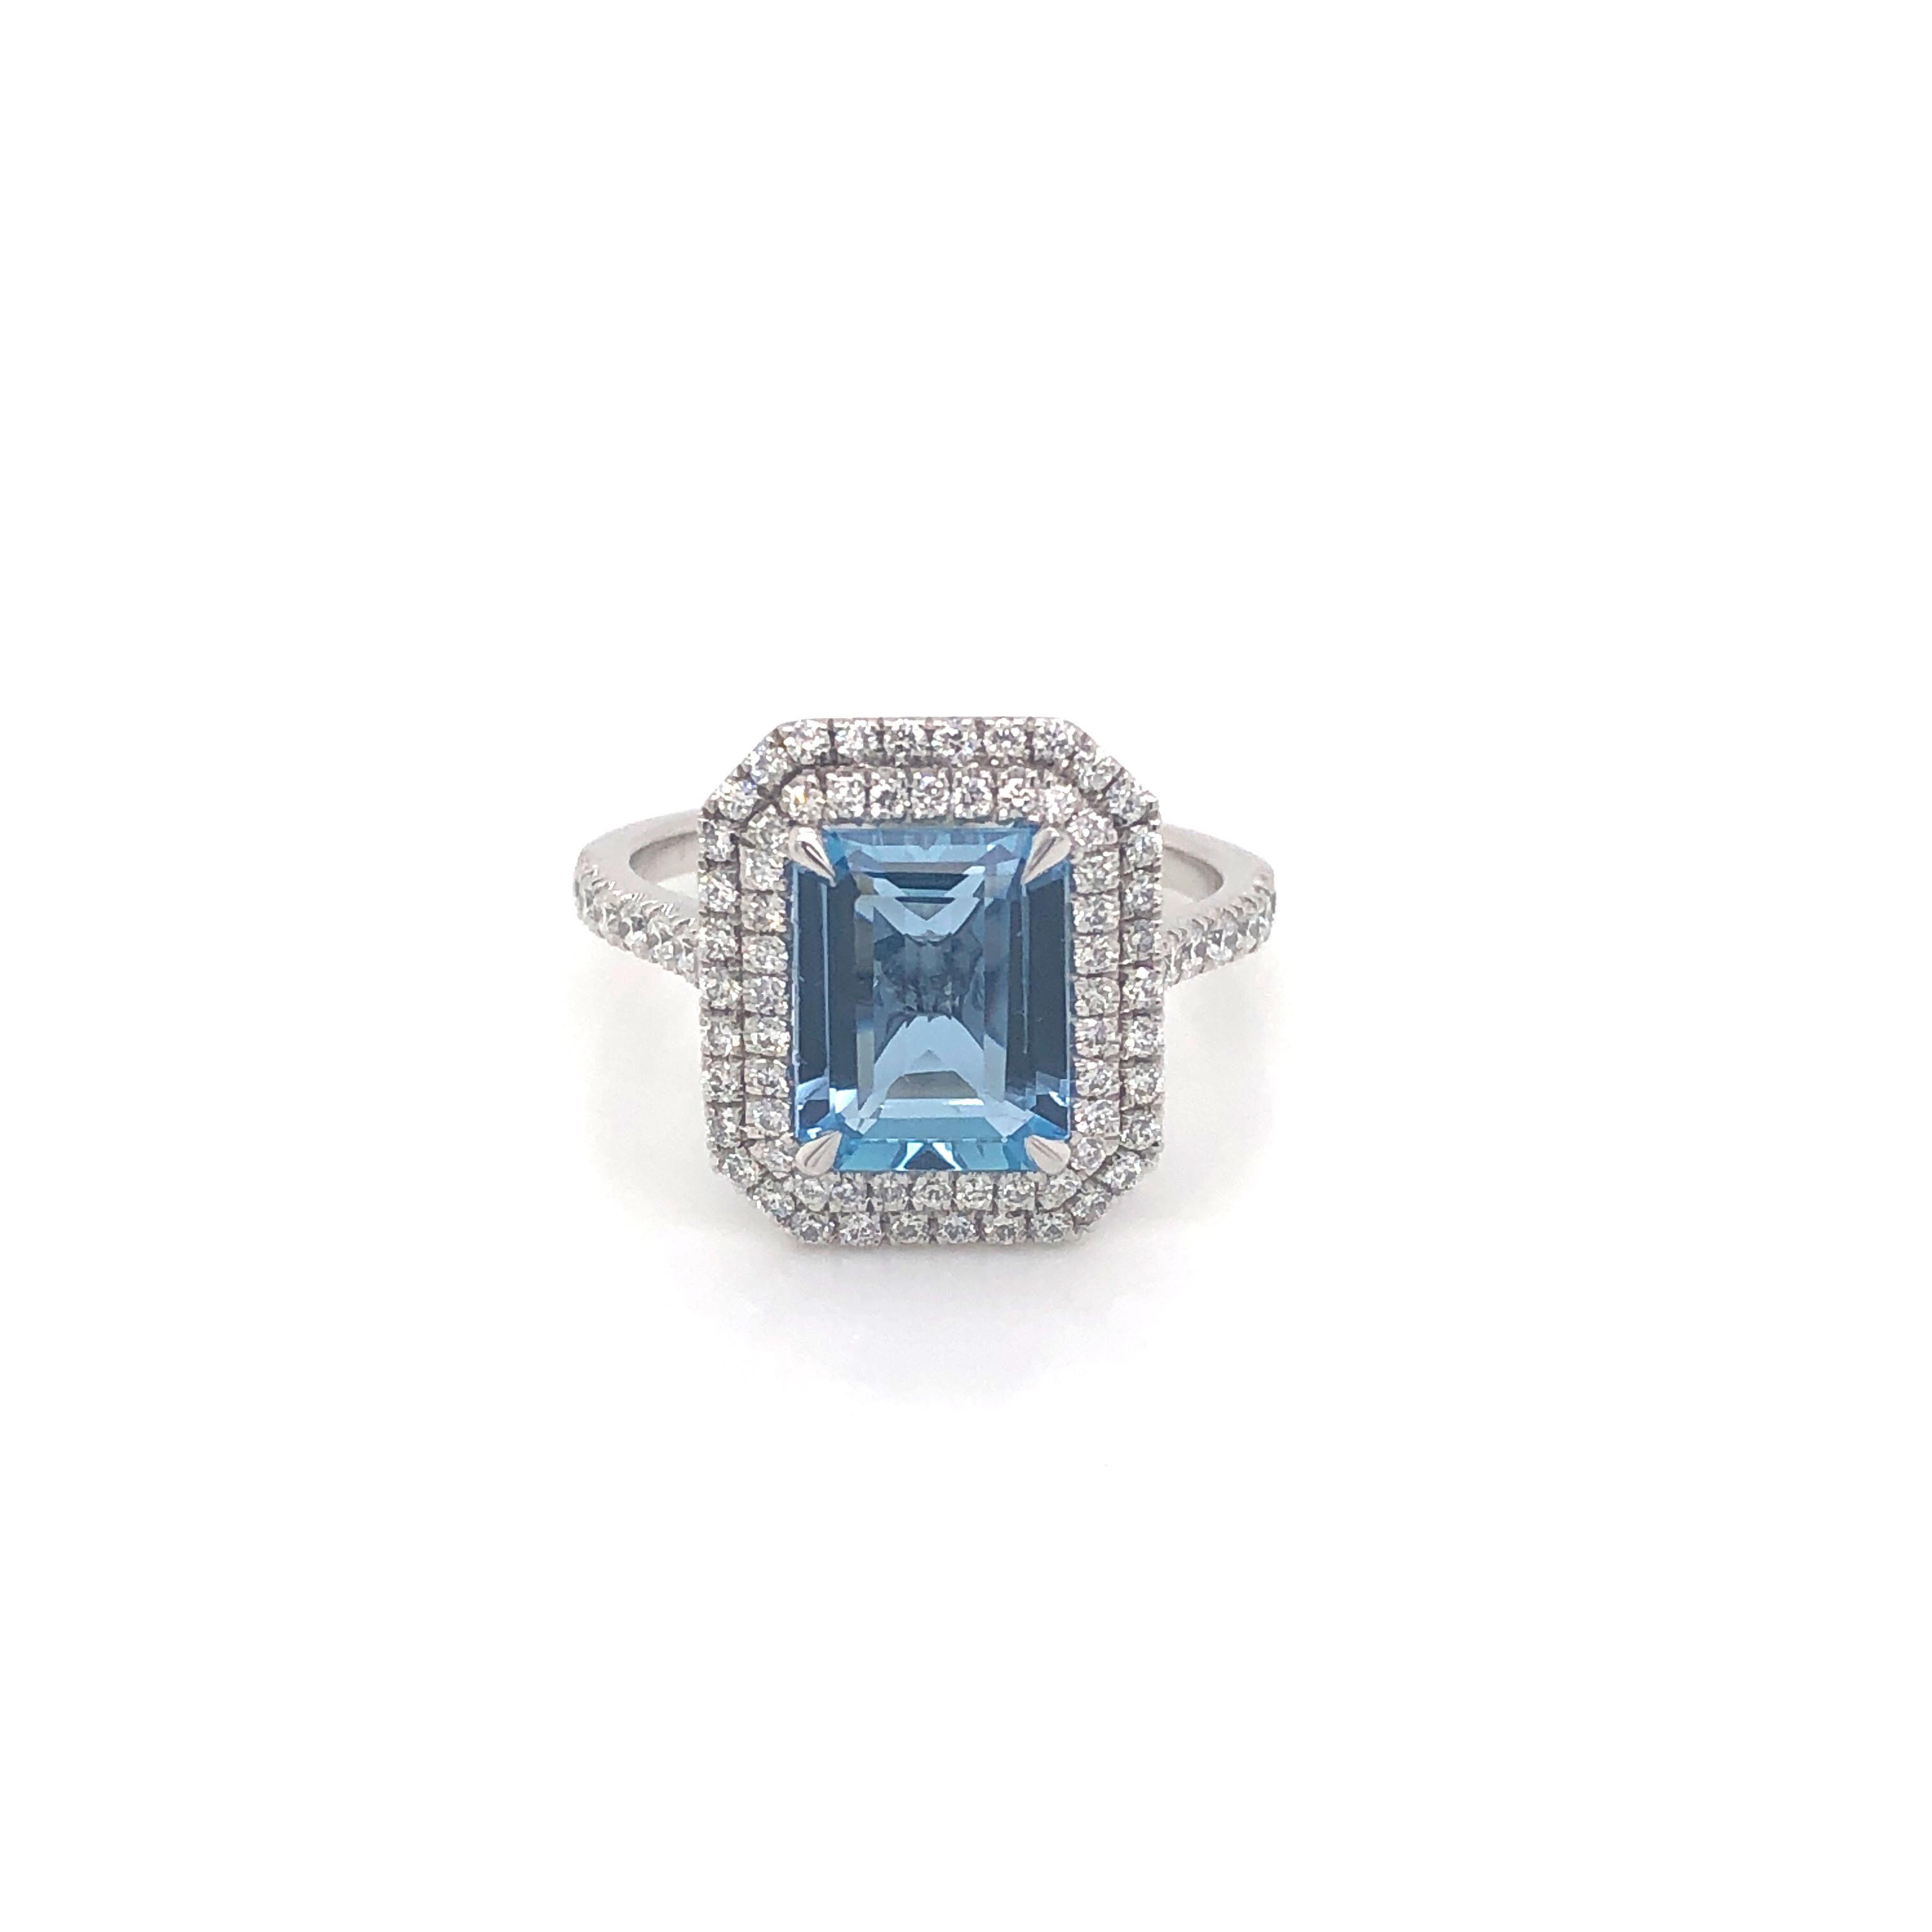 An Aqua Marine and diamond ring with a double Halo.